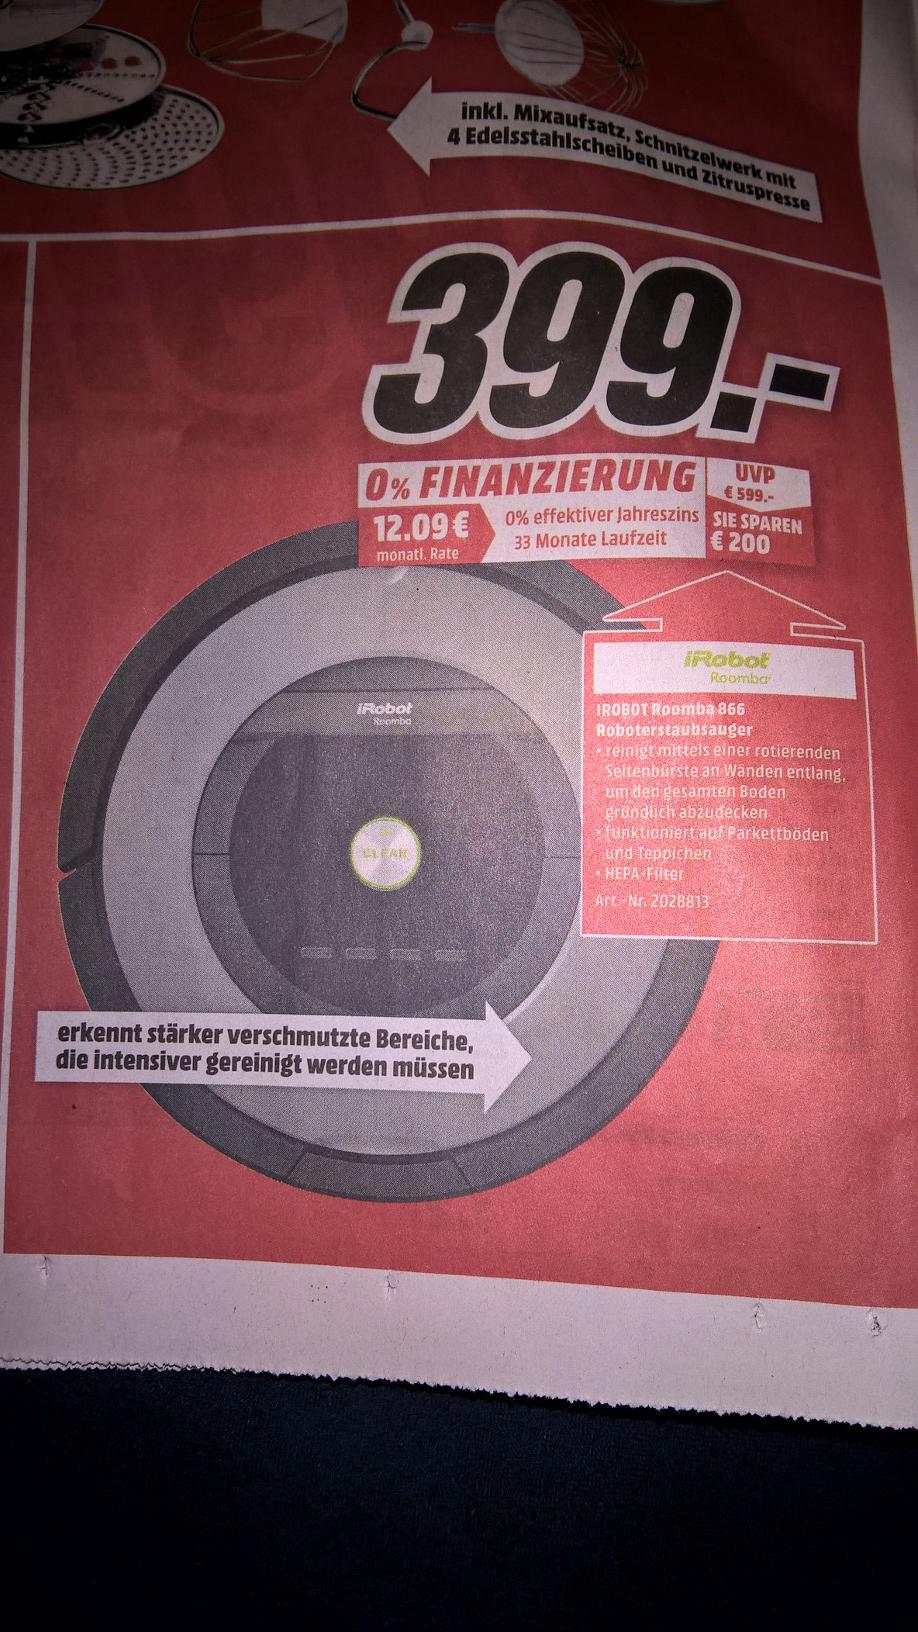 [Lokal] Media Märkte Heilbronn - IROBOT Roomba 866 Staubsaugerroboter